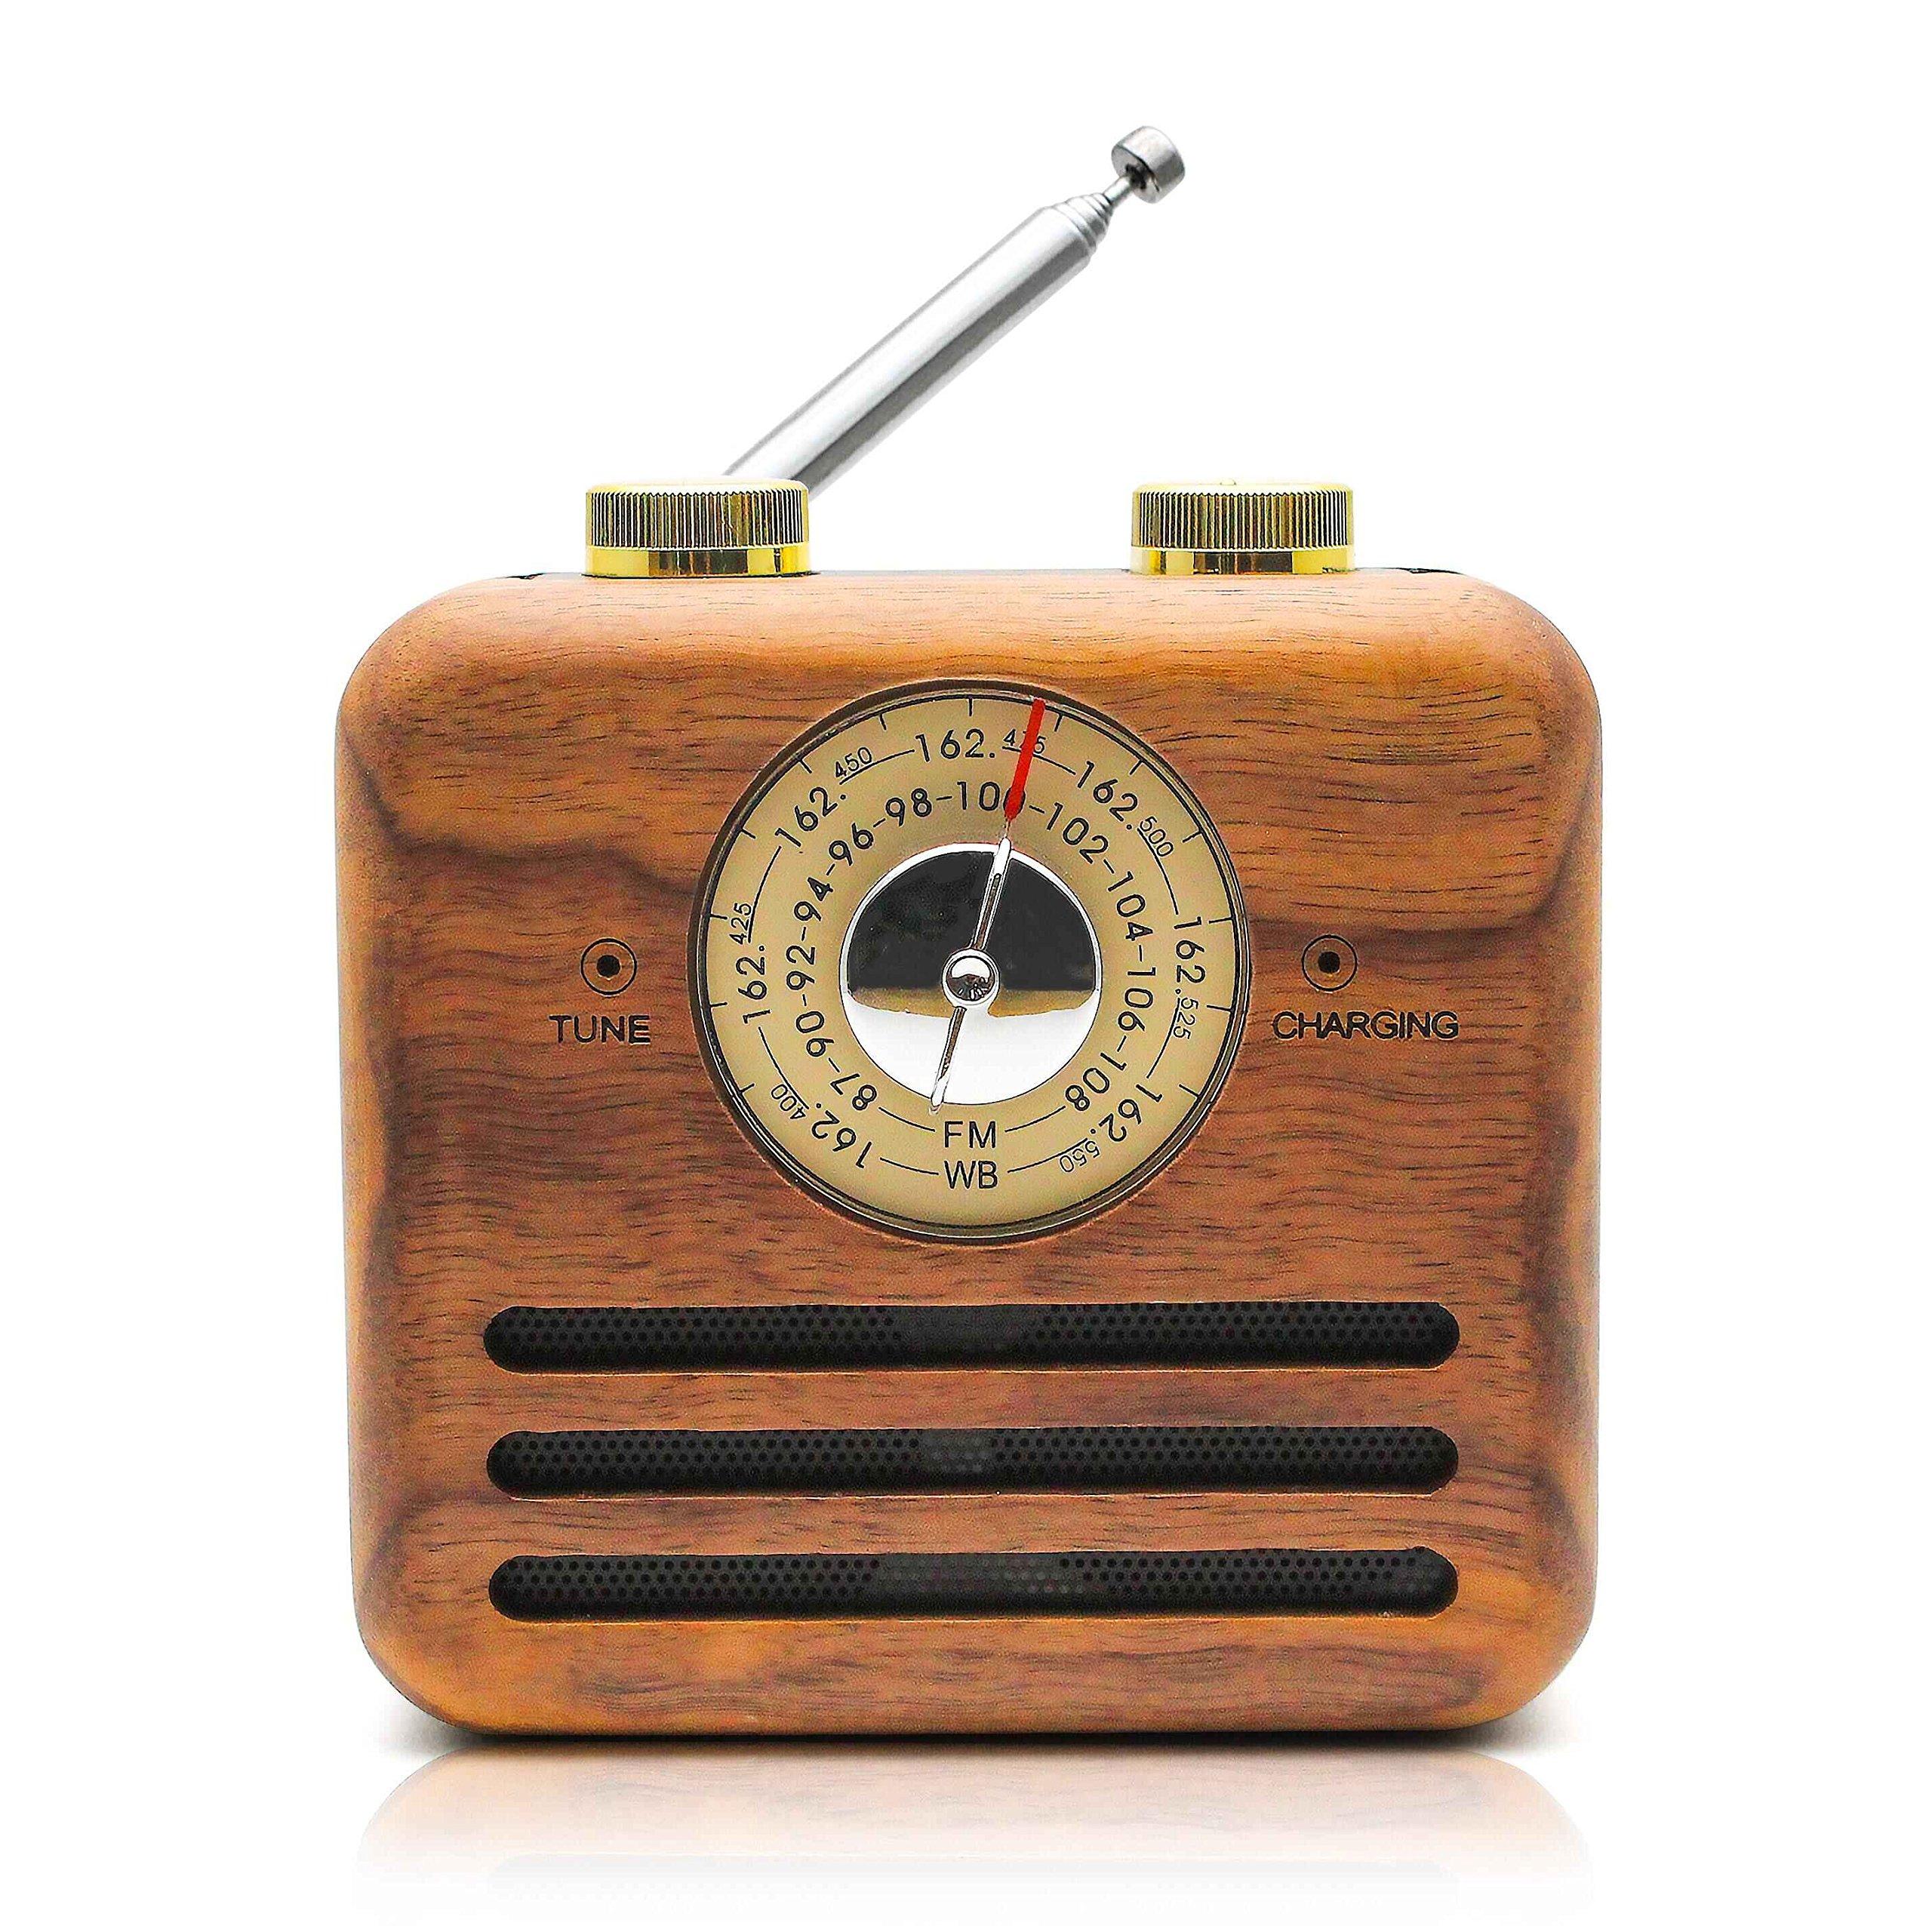 Retro Speaker Radios, Wireless Bluetooth Speaker Wood FM/WB Radio, Natural Walnut Material, Loud Clear Sound Home, Office, Travel